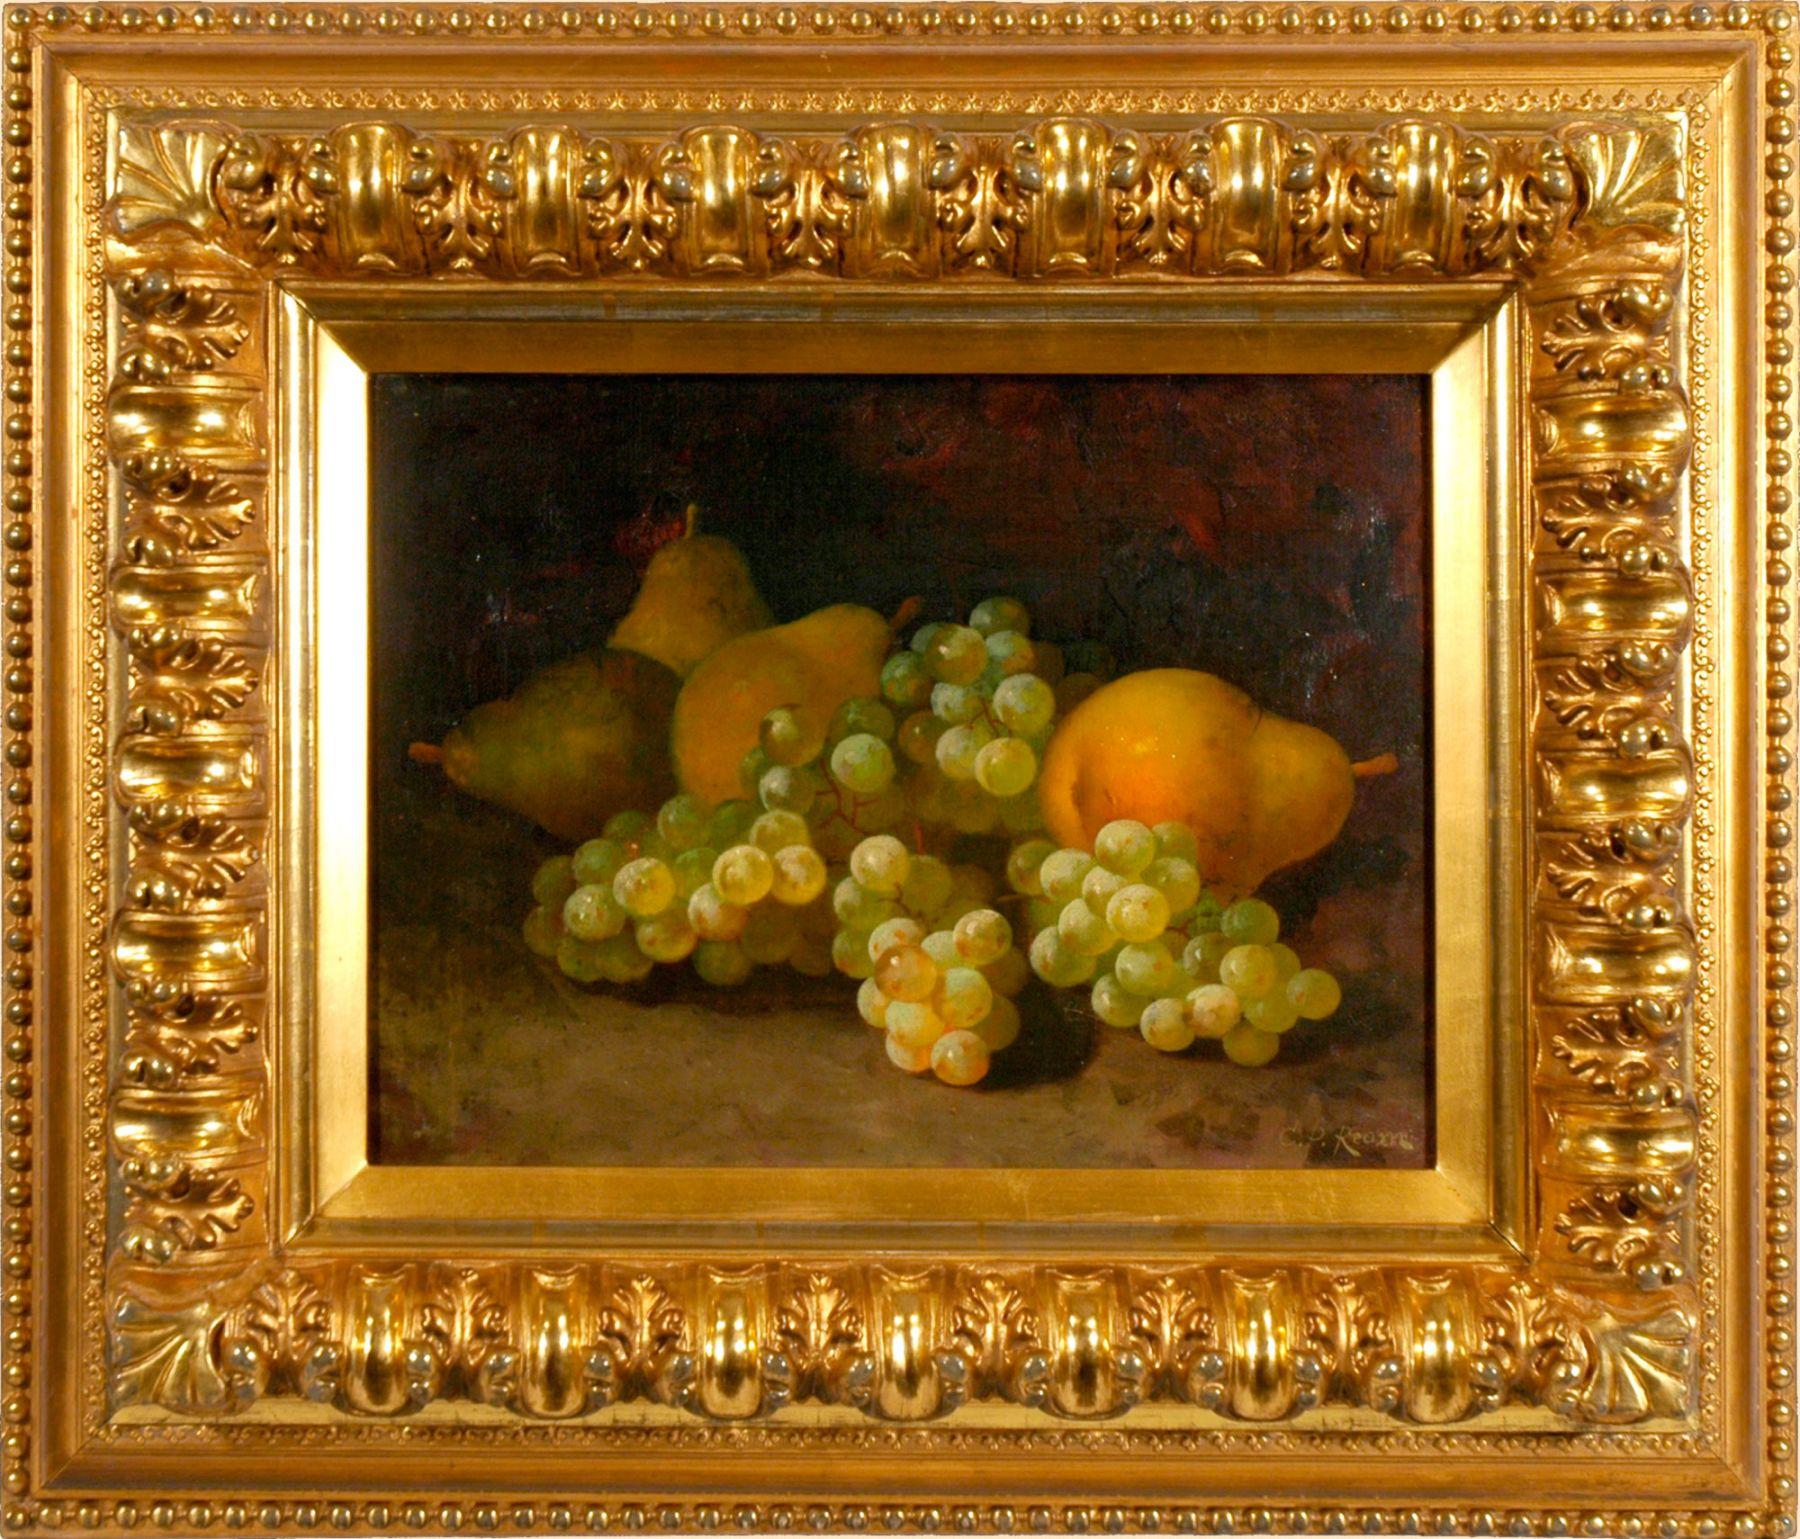 CARDUCIUS PLANTAGENET REAM (1837-1917), Still Life, 1885